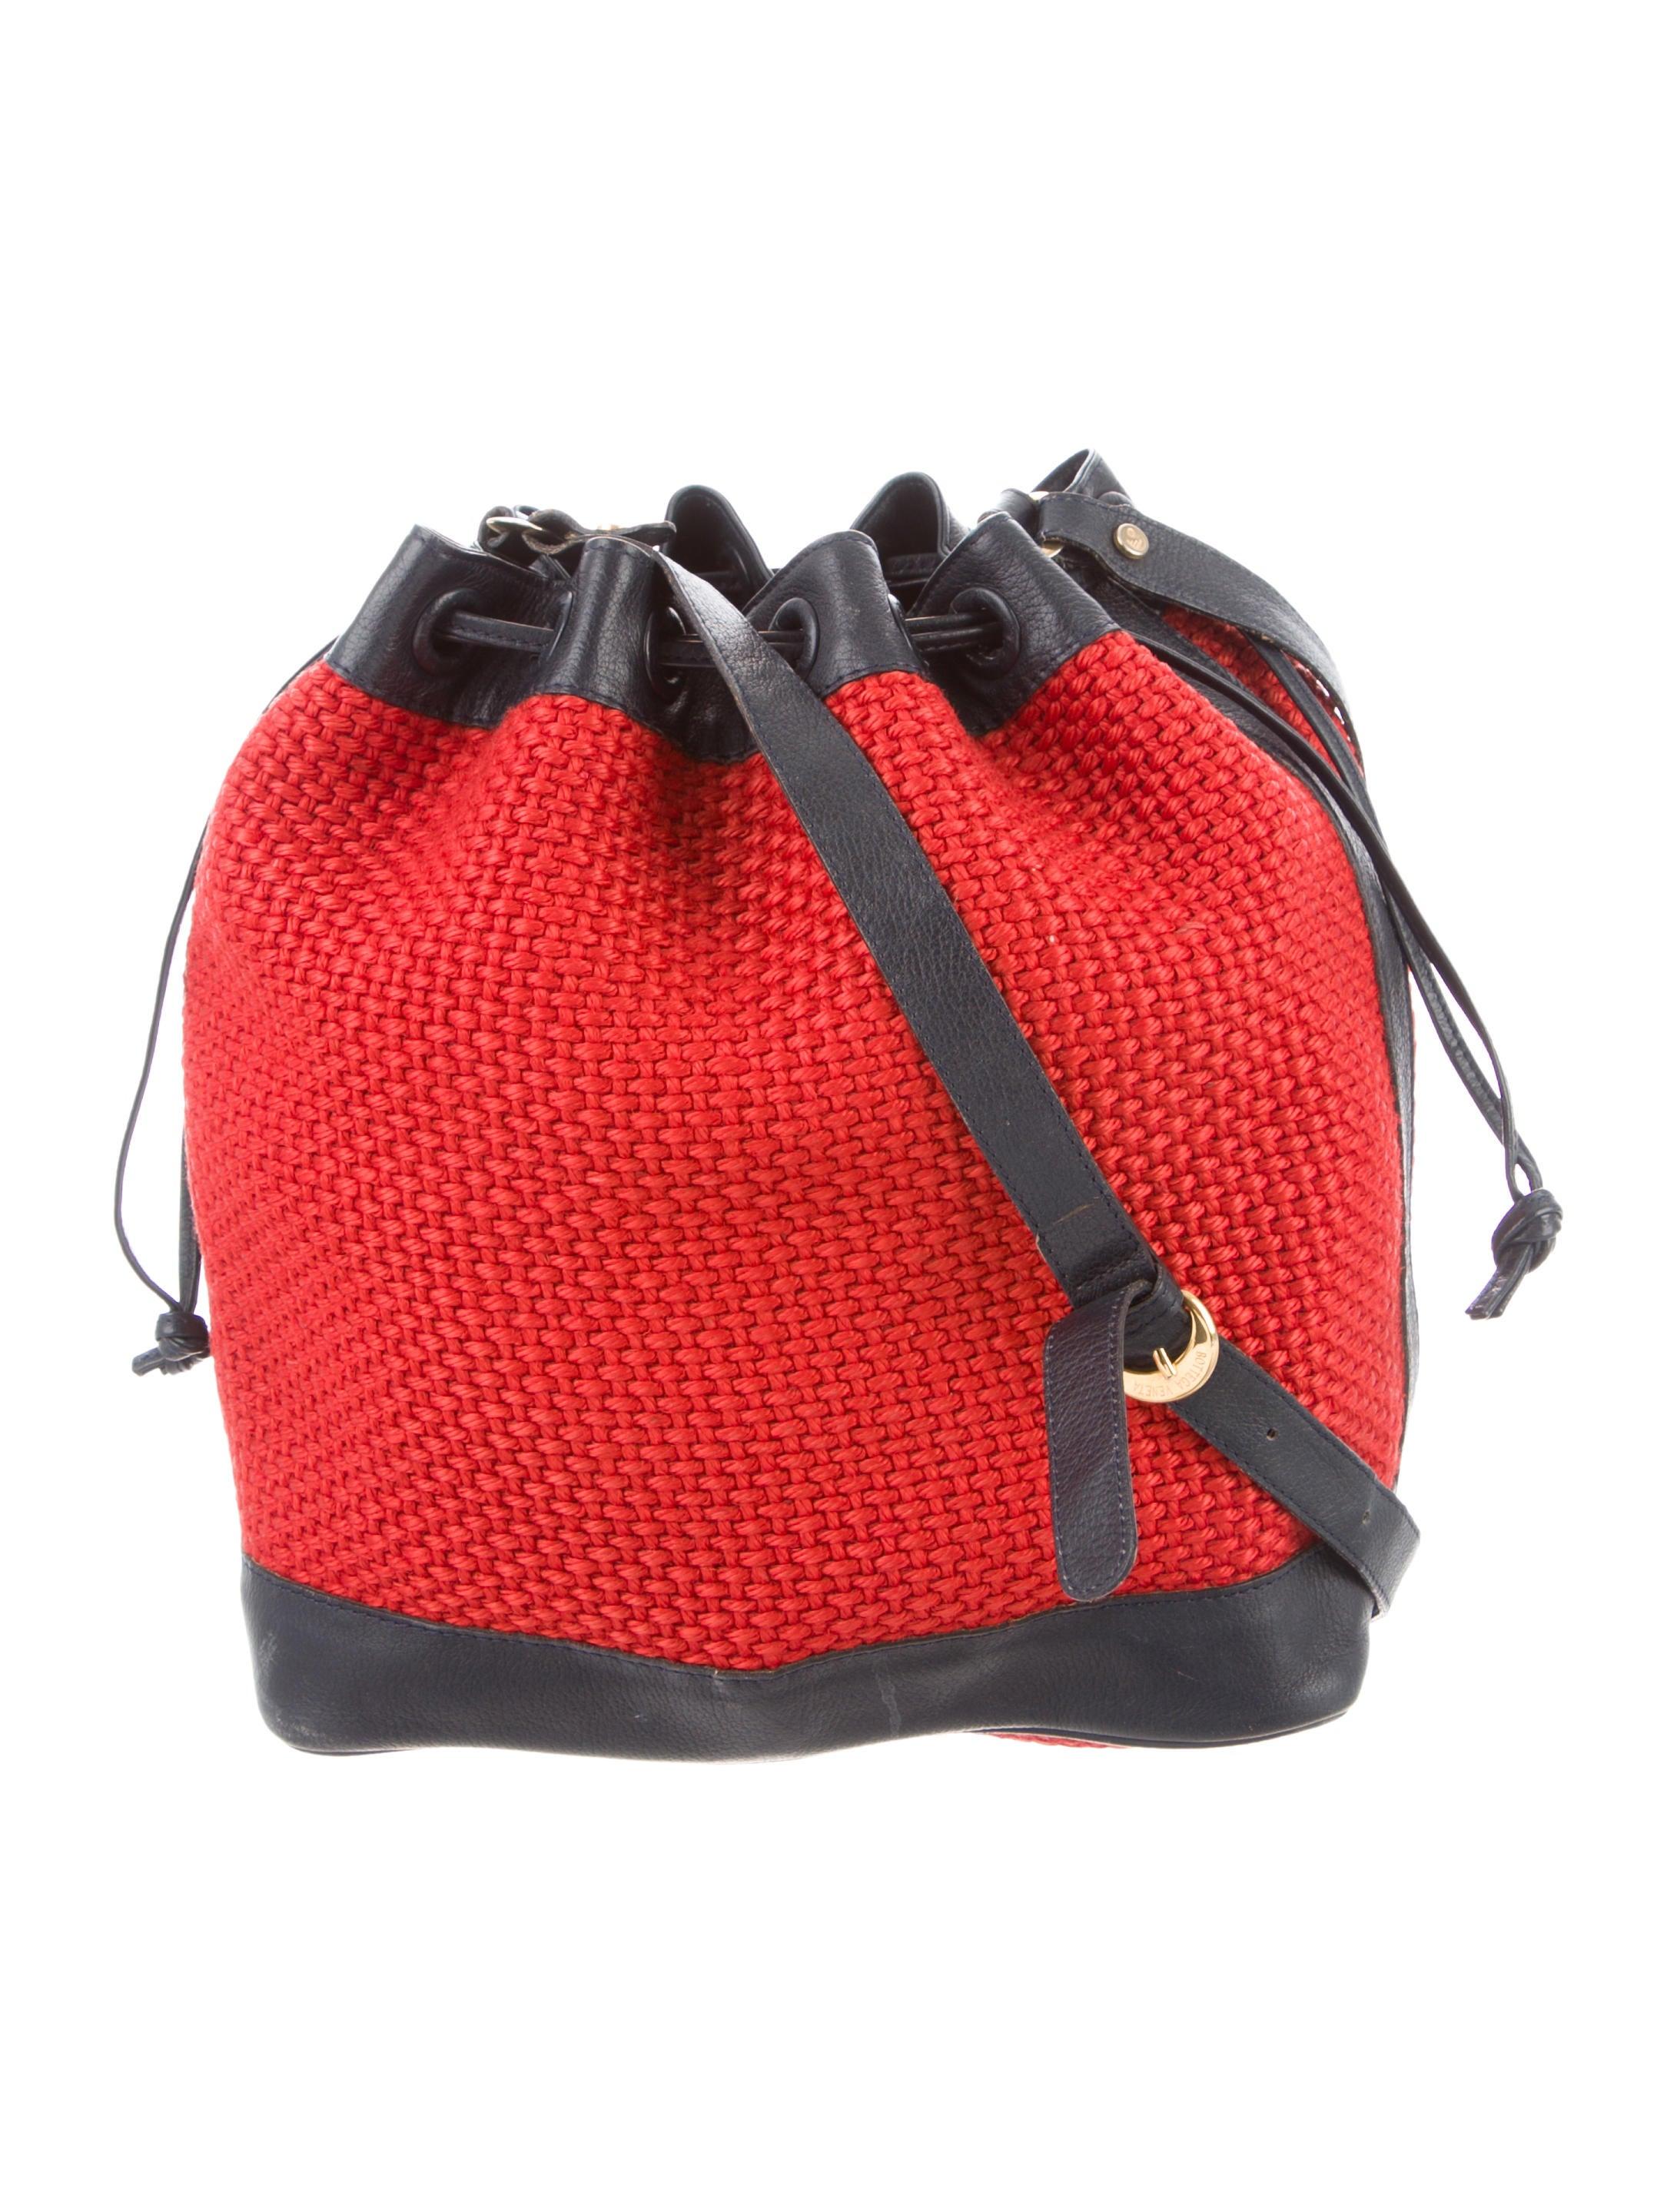 717d6221a4a4 Bottega Veneta Leather-Trimmed Bucket Bag - Handbags - BOT61427 ...